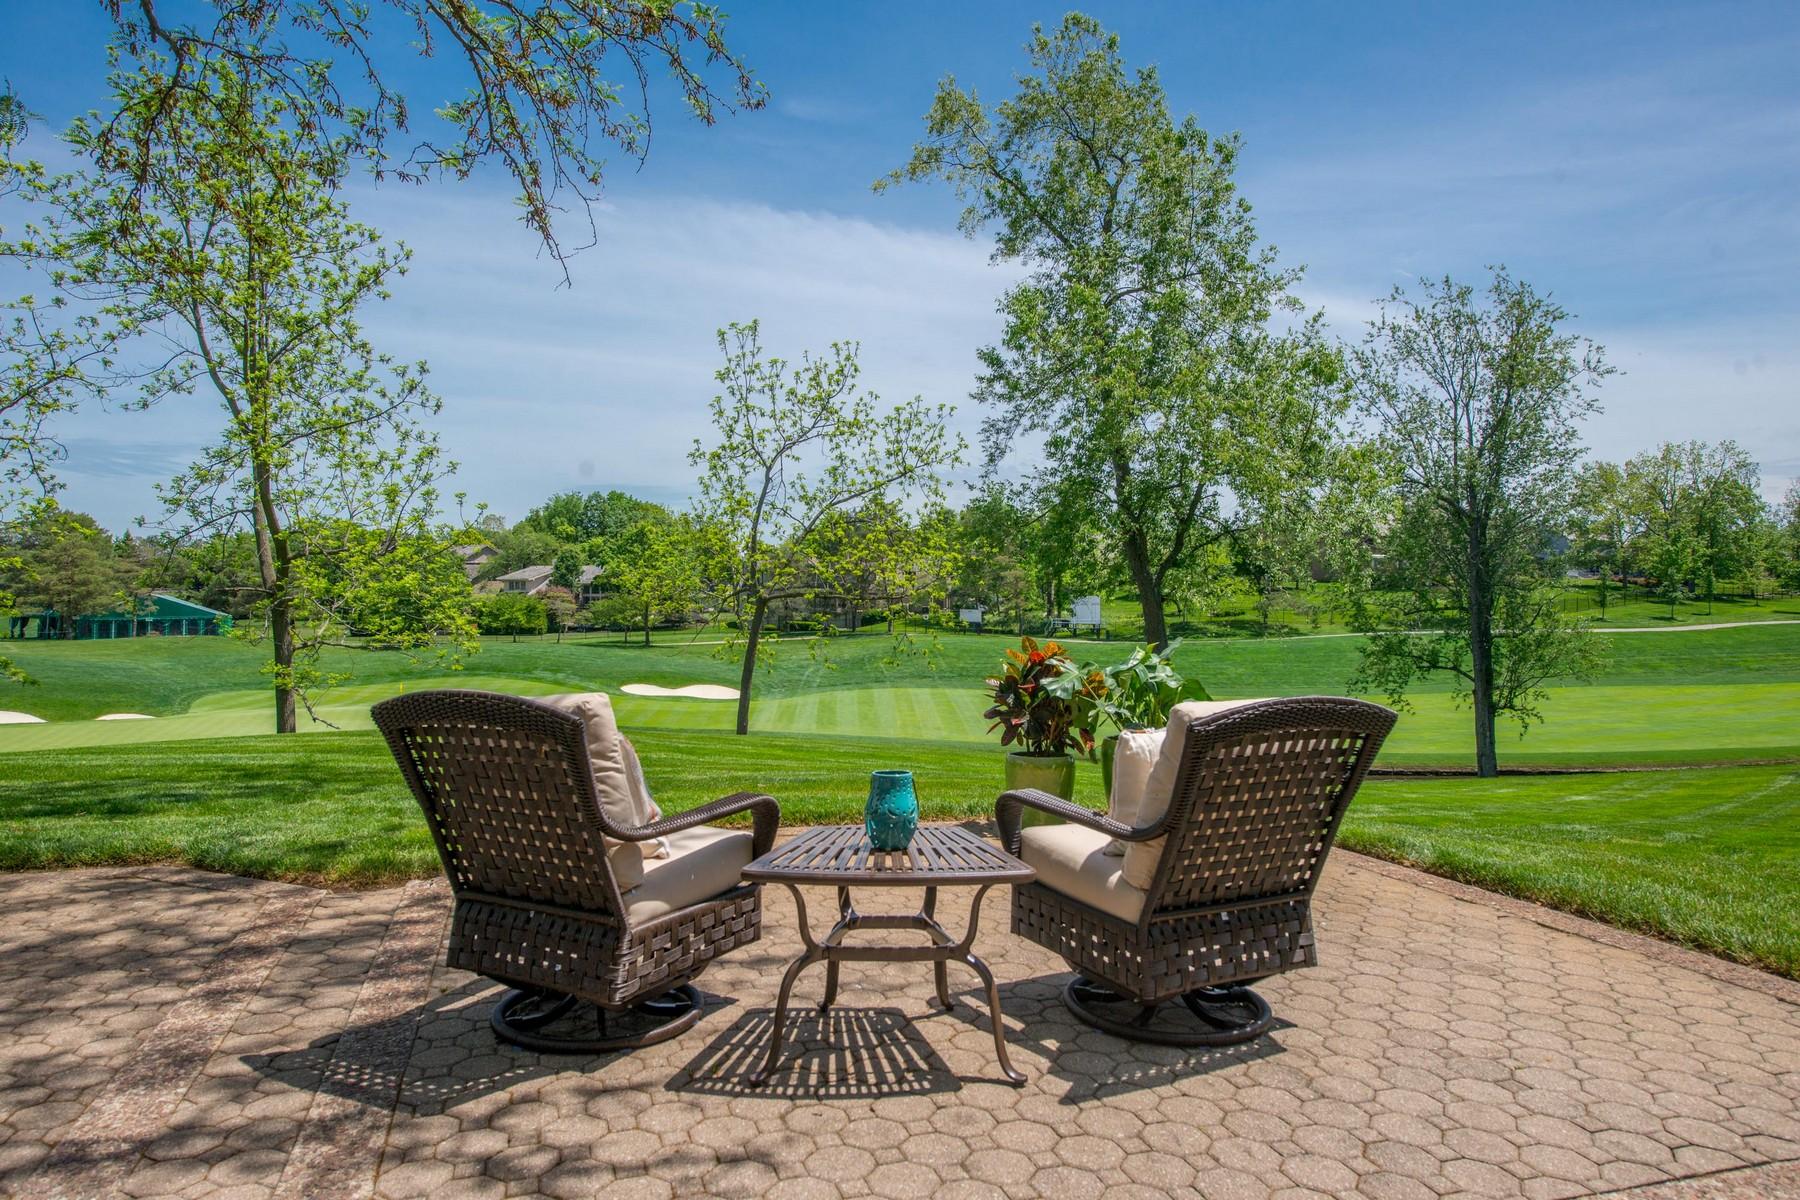 Additional photo for property listing at 8455 Dunsinane Drive  Dublin, Ohio 43017 United States